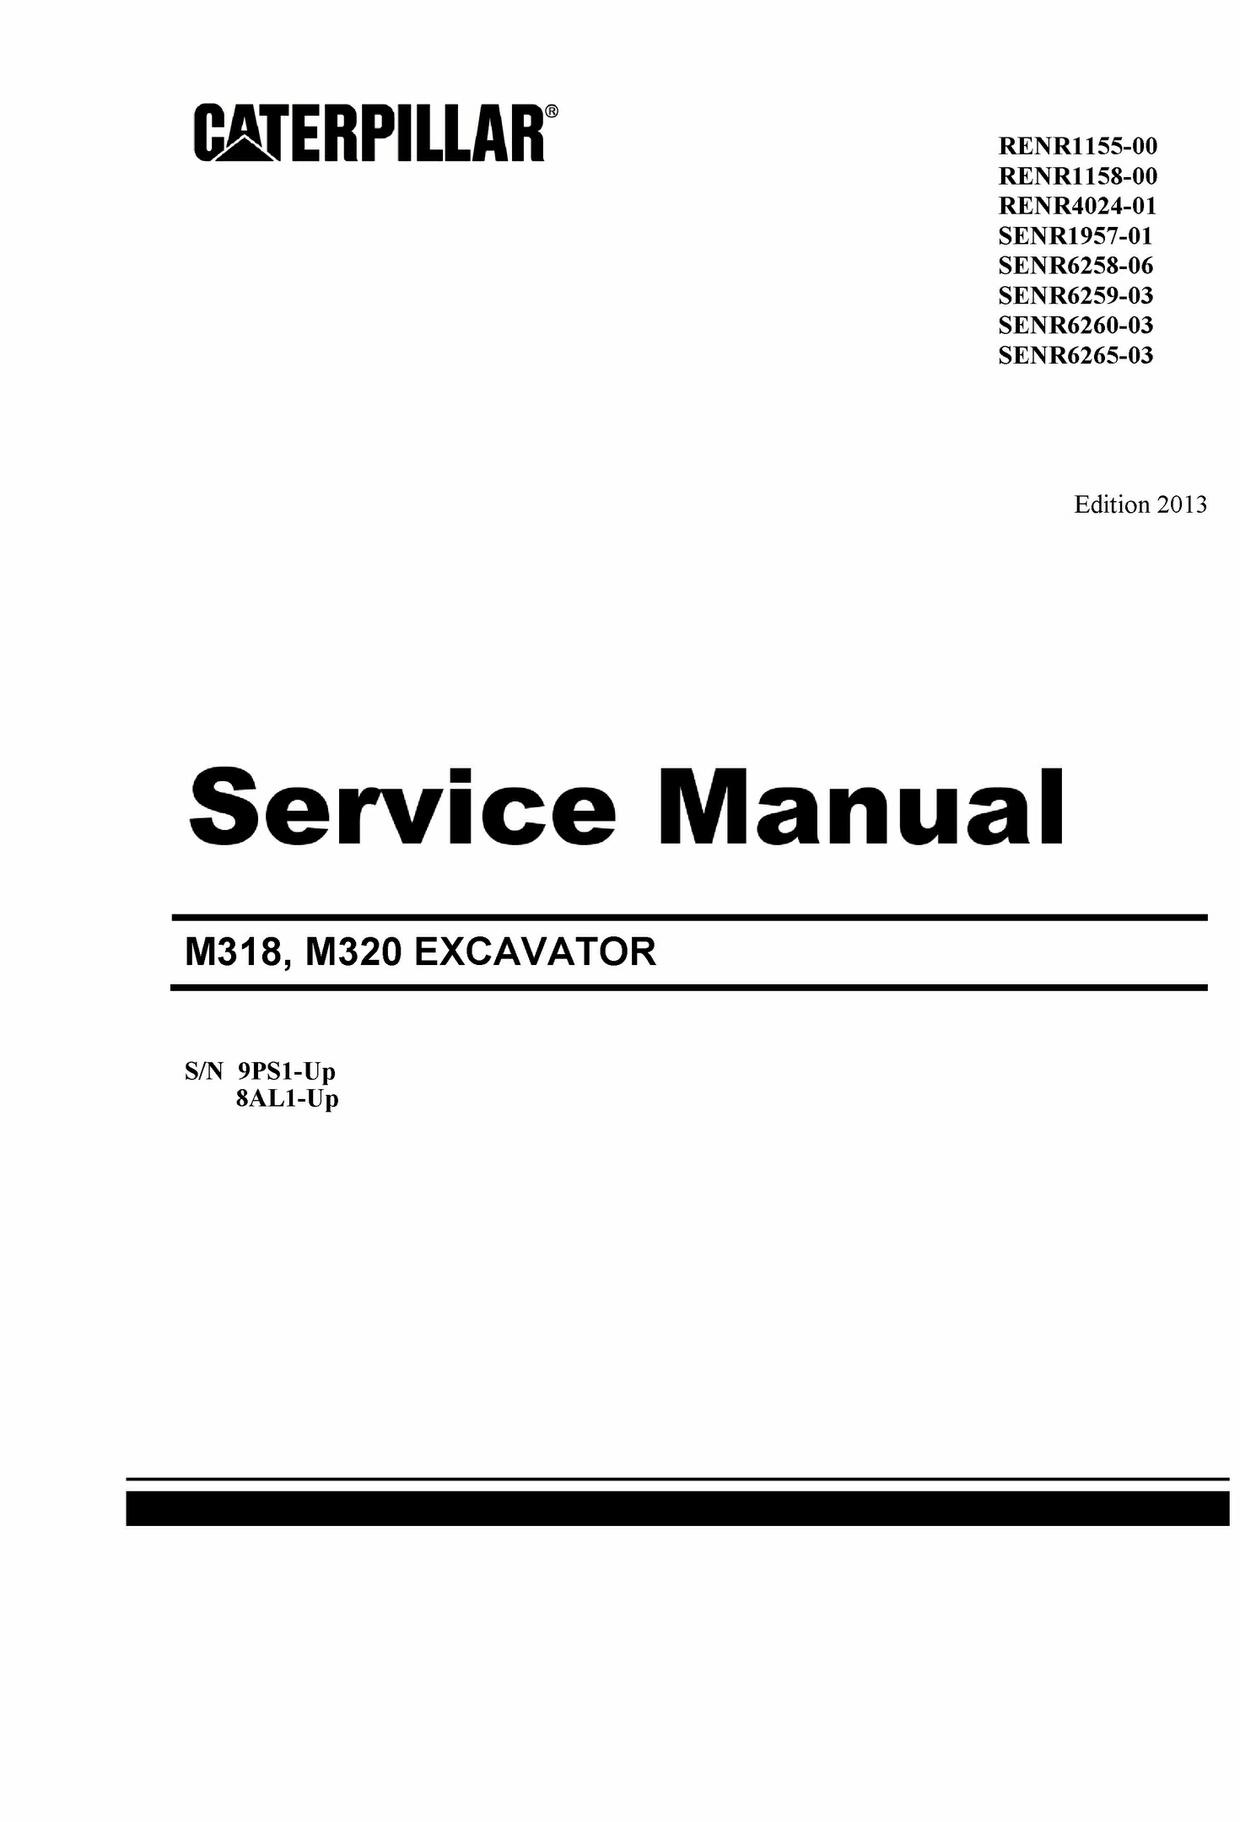 Cat Caterpillar M318 M320 Wheeled Excavator Complete Repair Service Manual INSTANT DOWNLOAD